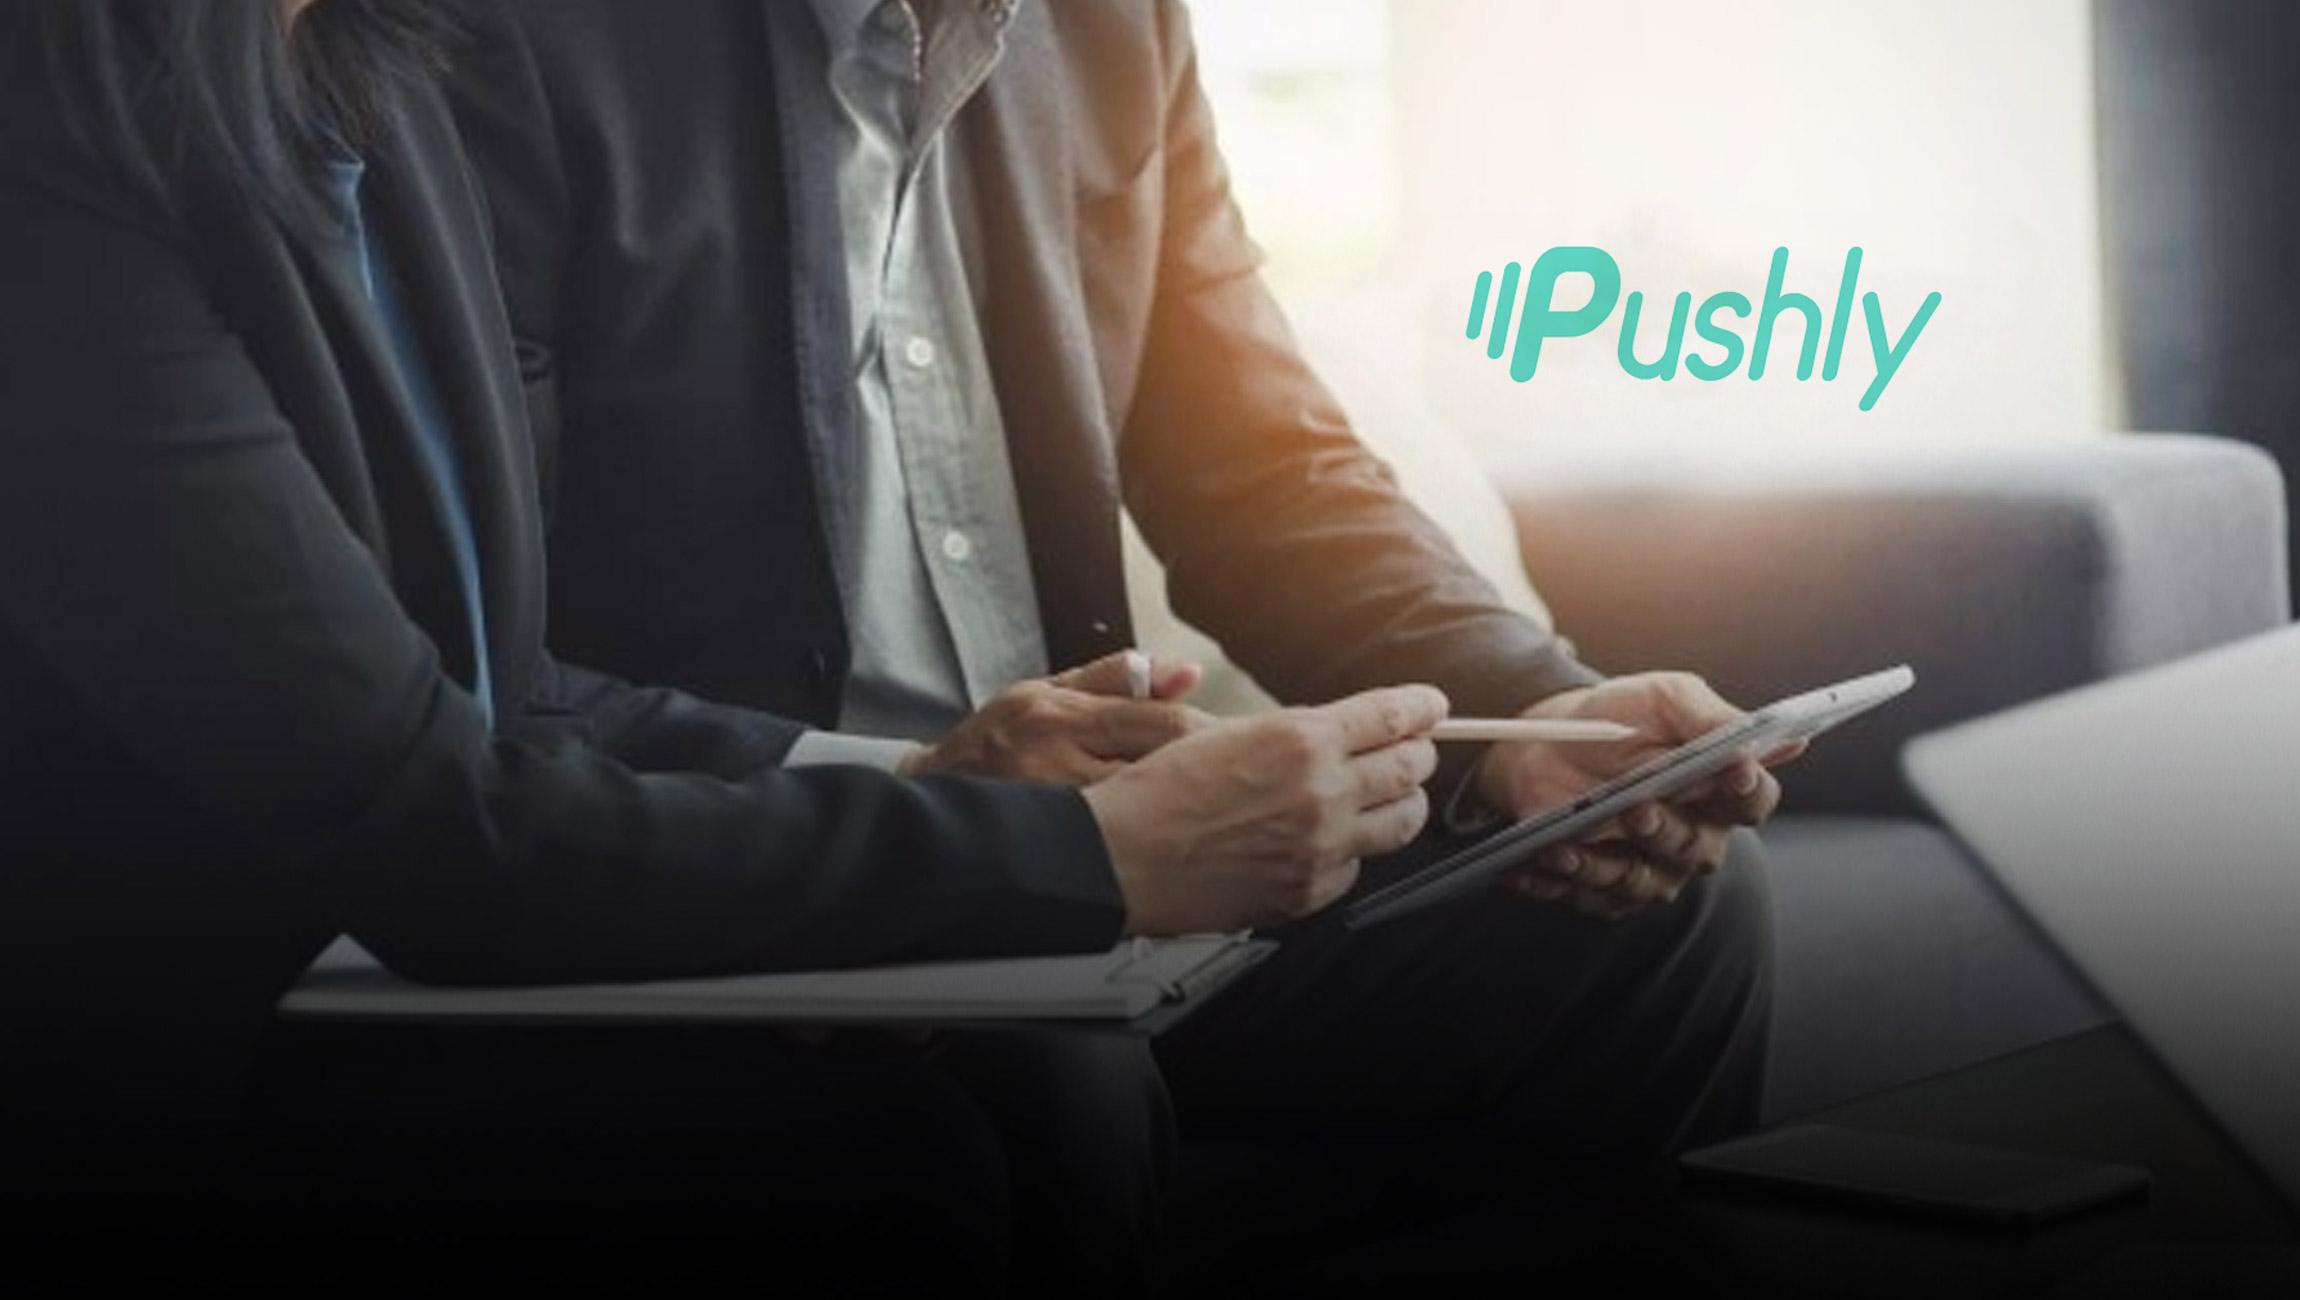 Pushly Names Media and Publishing Industry Leader Brendan Ripp CEO of Growing SaaS Push Notification Platform